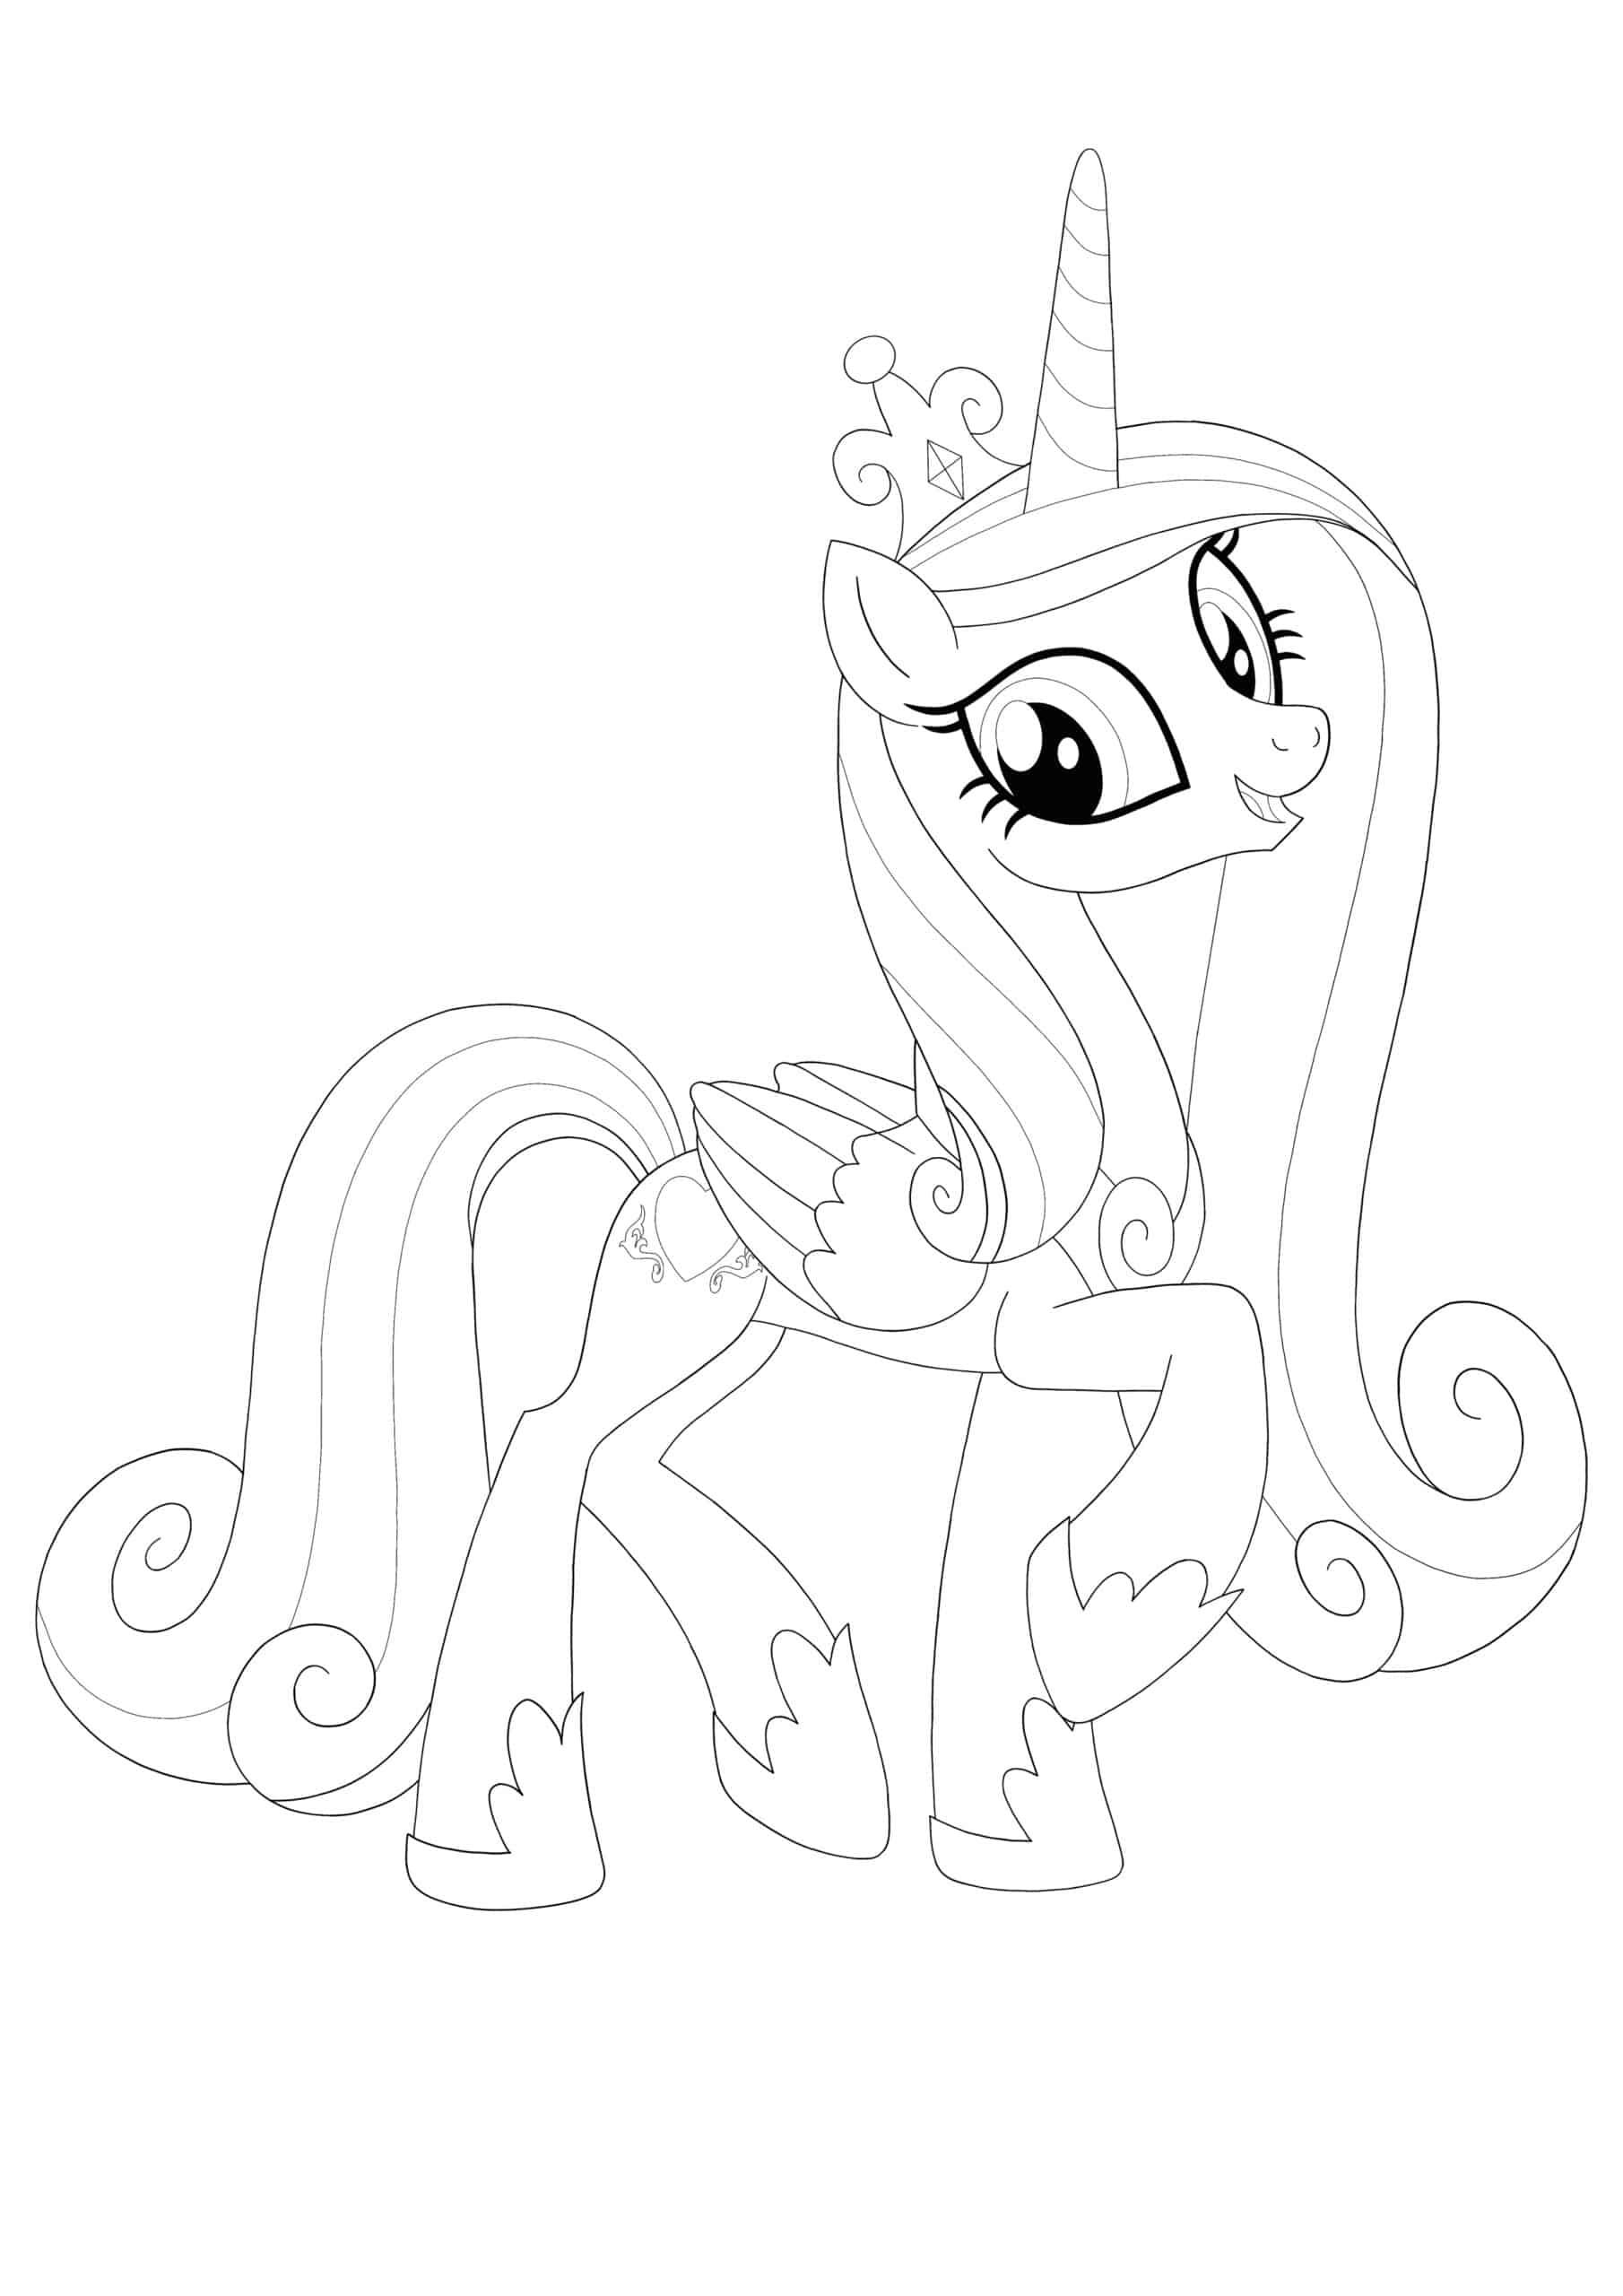 Princess Cadence coloring page